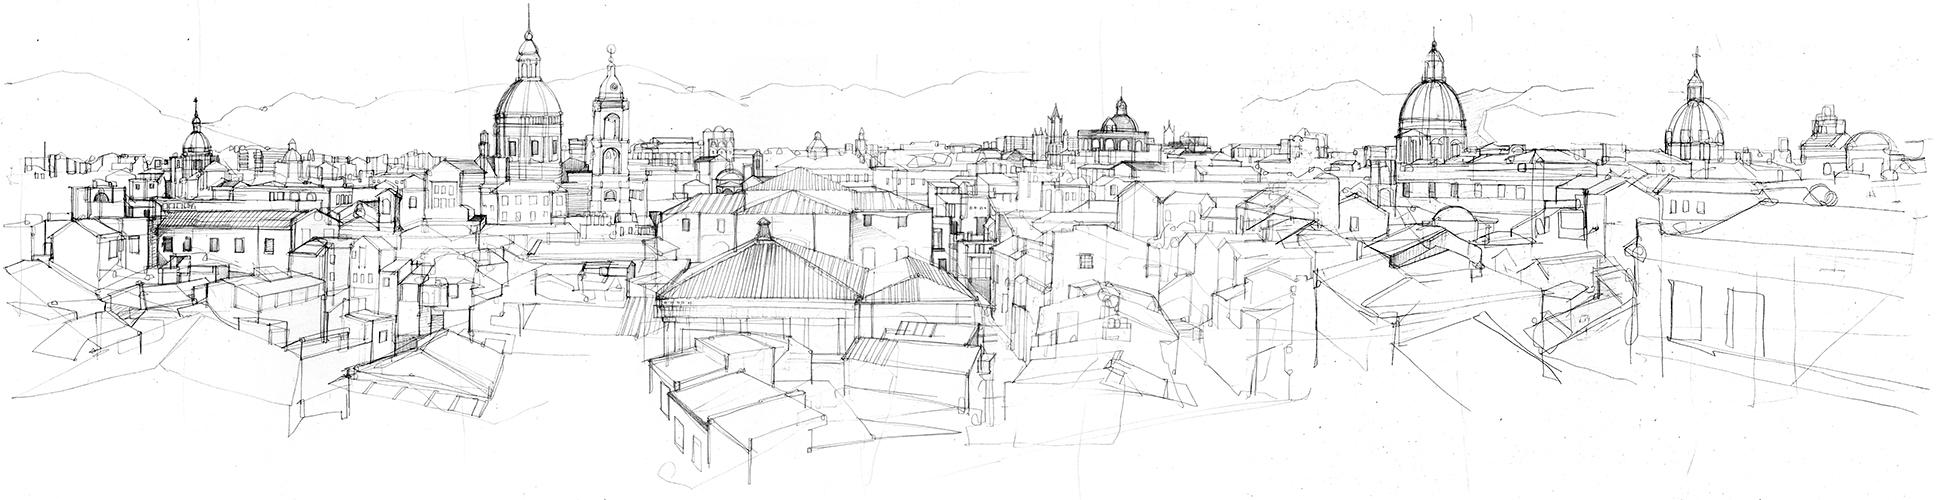 palermo panoramic drawing.jpg